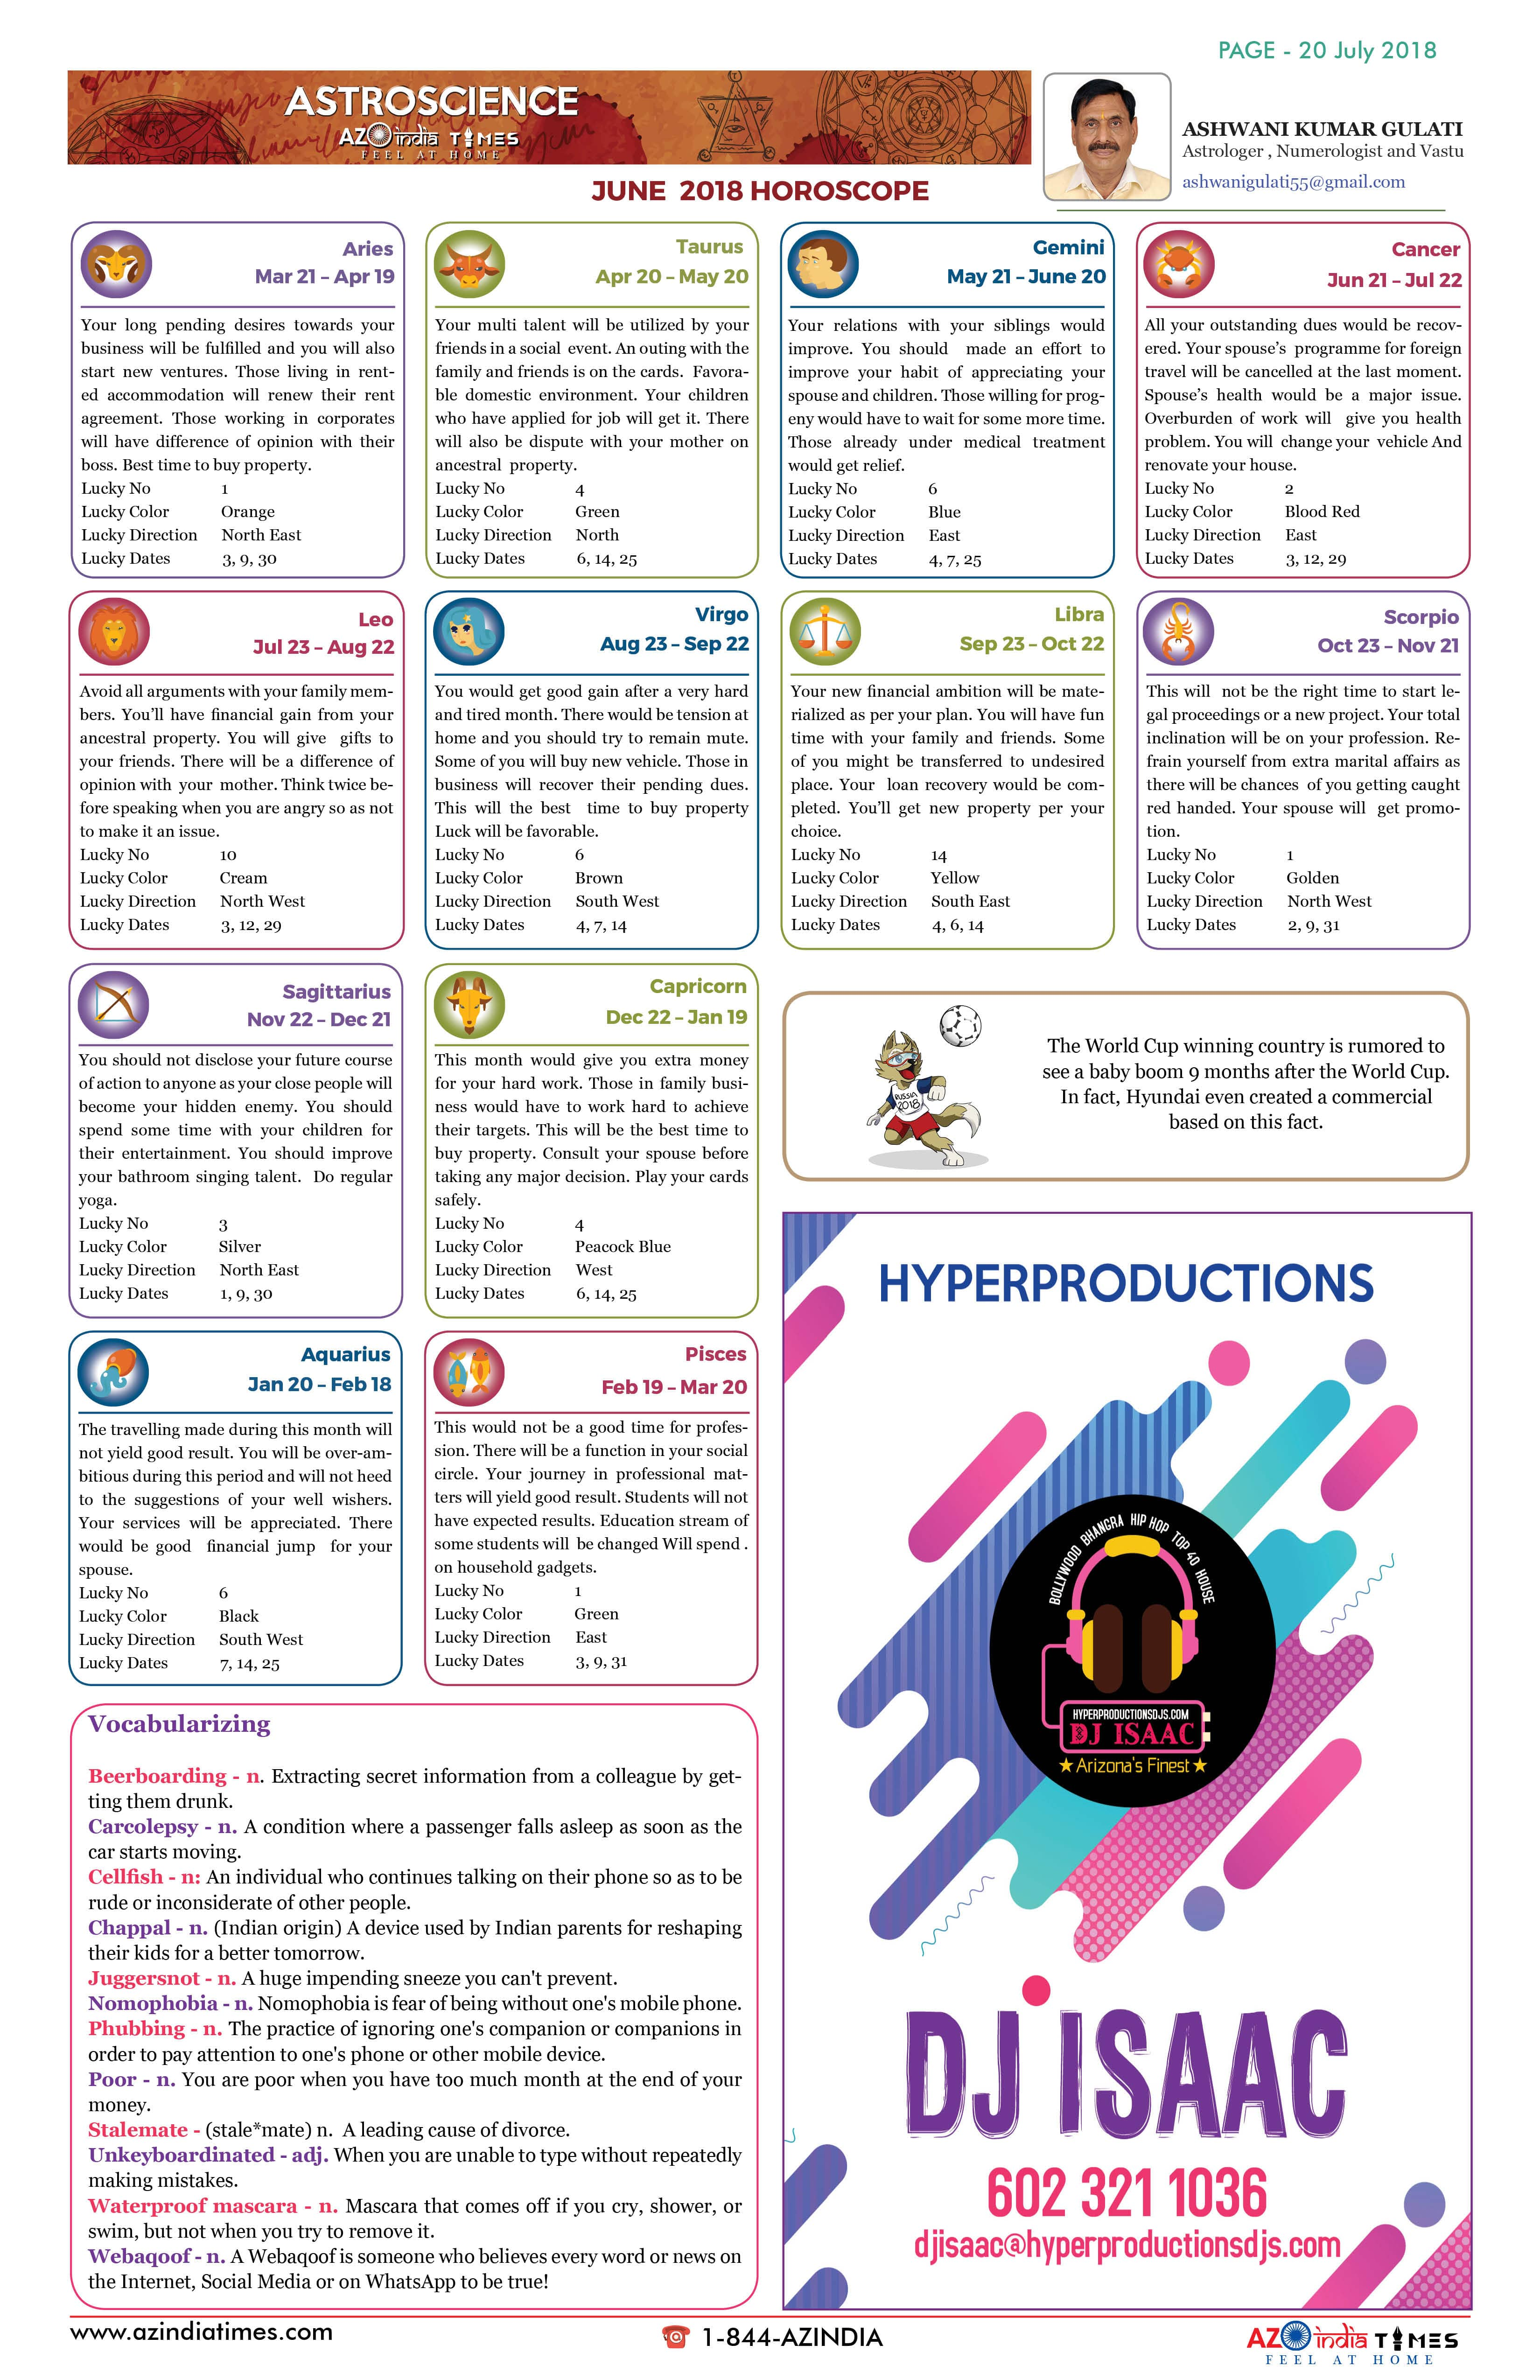 AZ INDIA JULY EDITION20